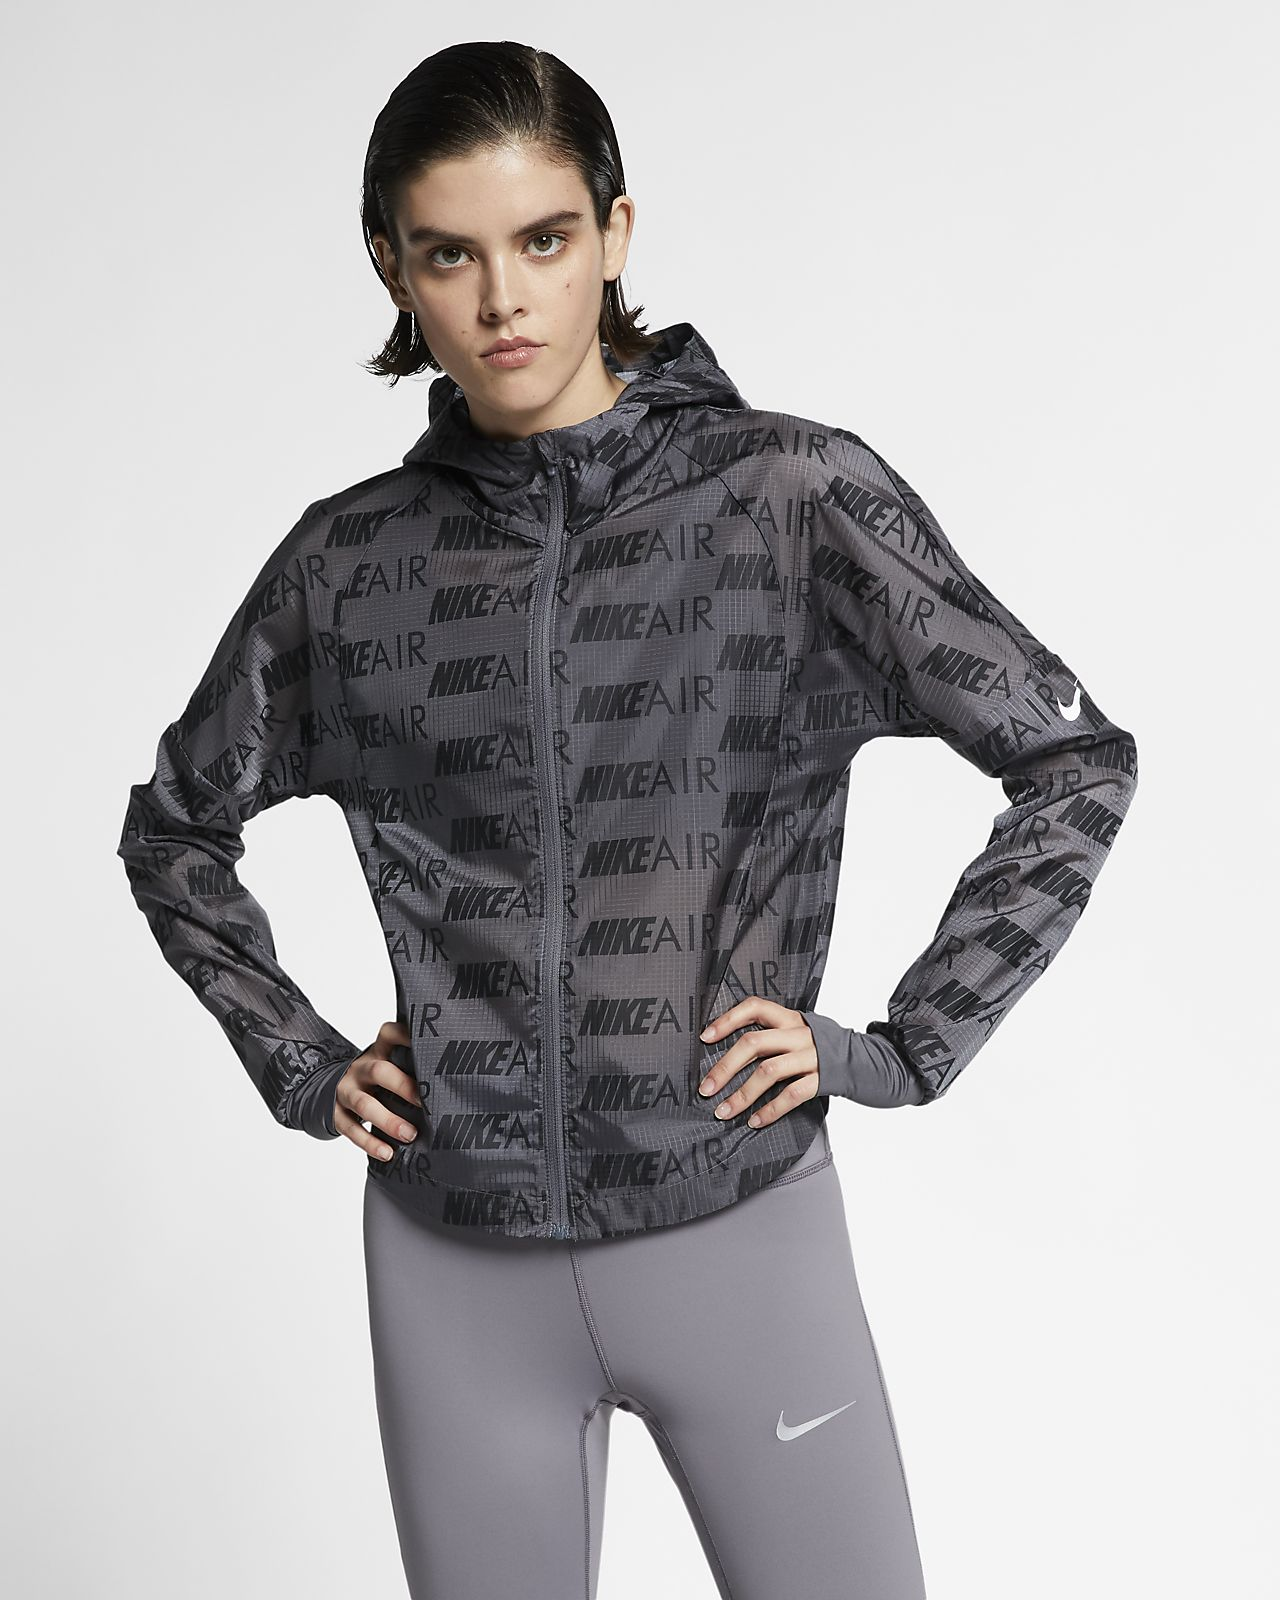 fe4f0b7c6af0 Veste de running à capuche Nike Air pour Femme. Nike.com CA